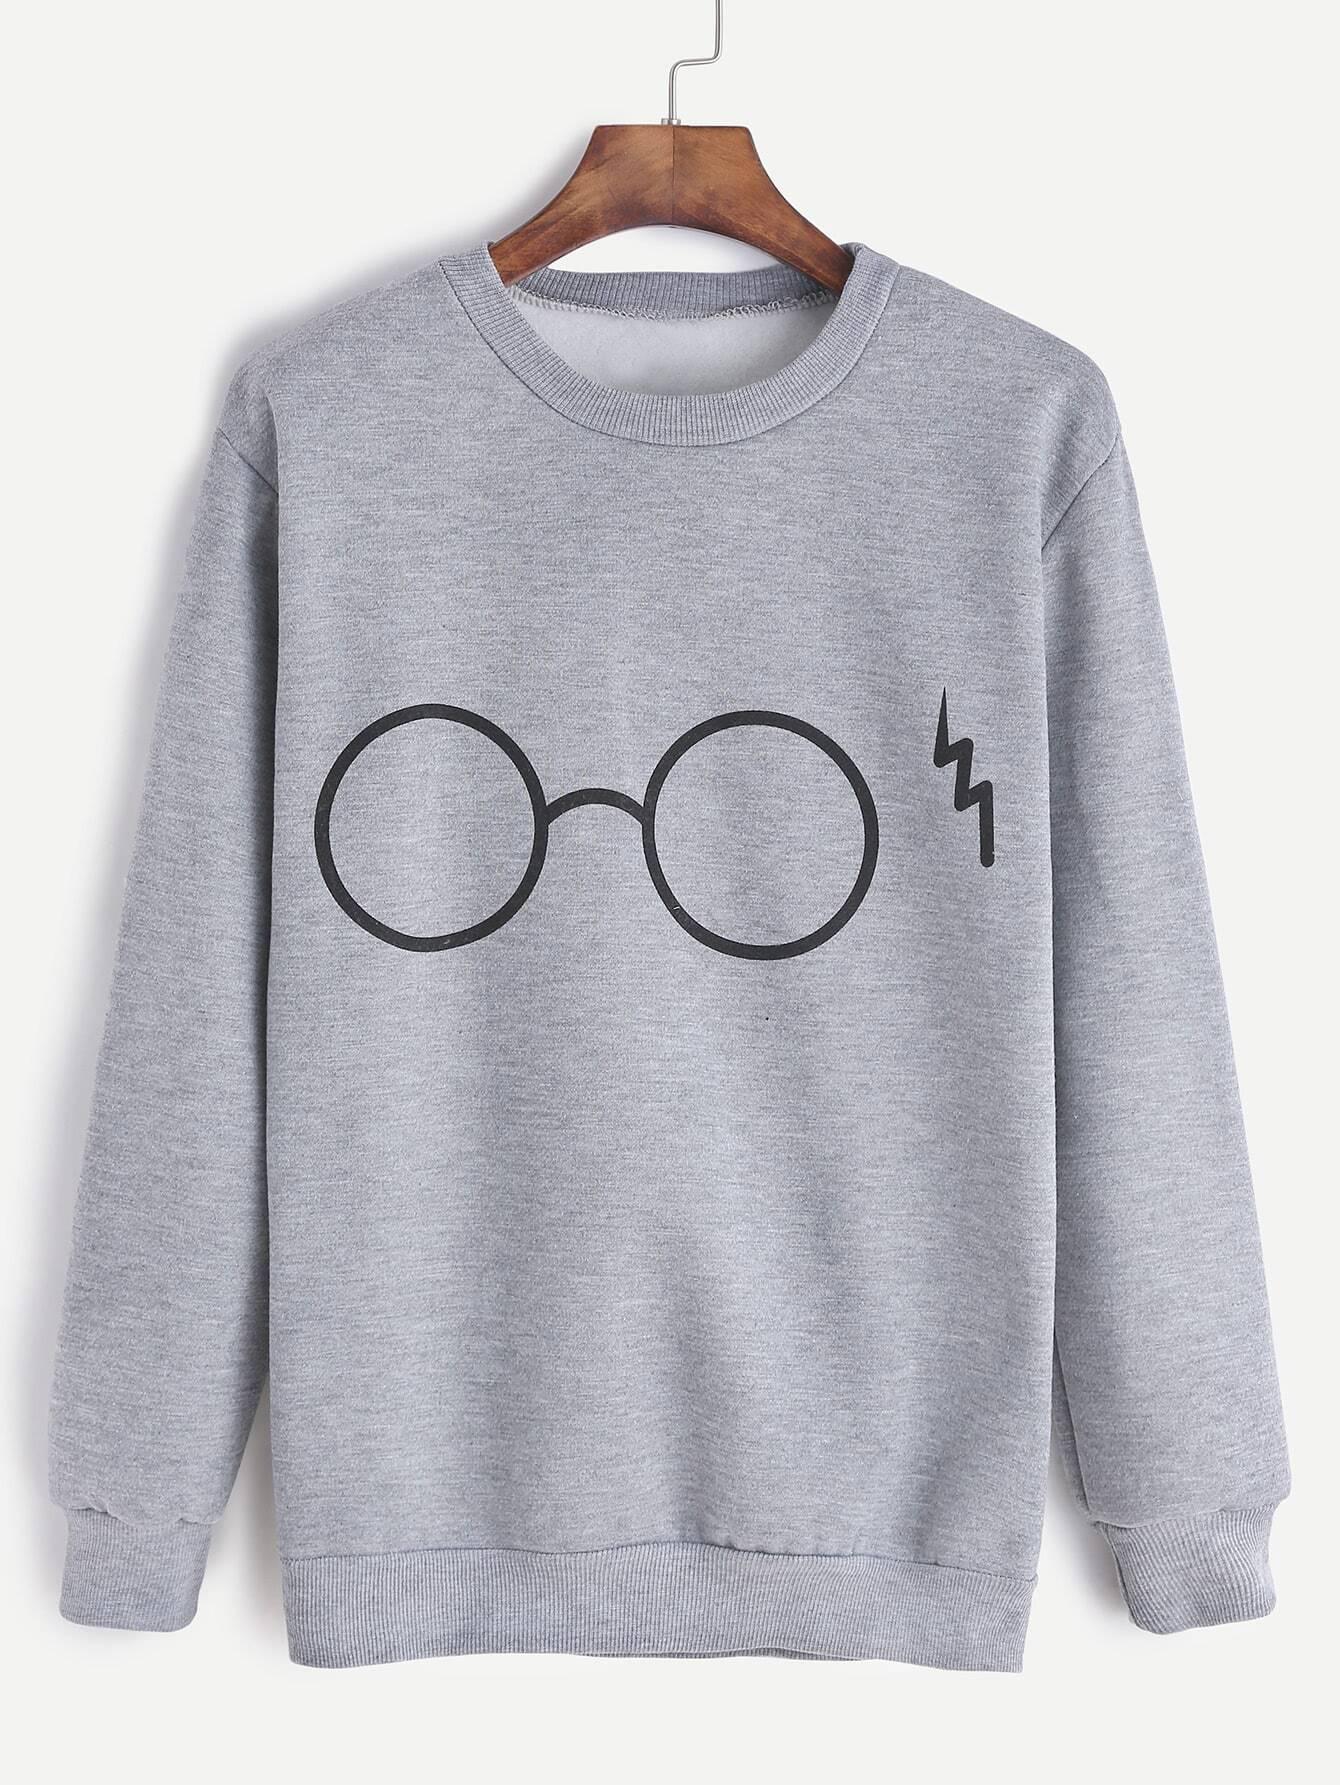 Glasses Print Sweatshirt sweatshirt161021106